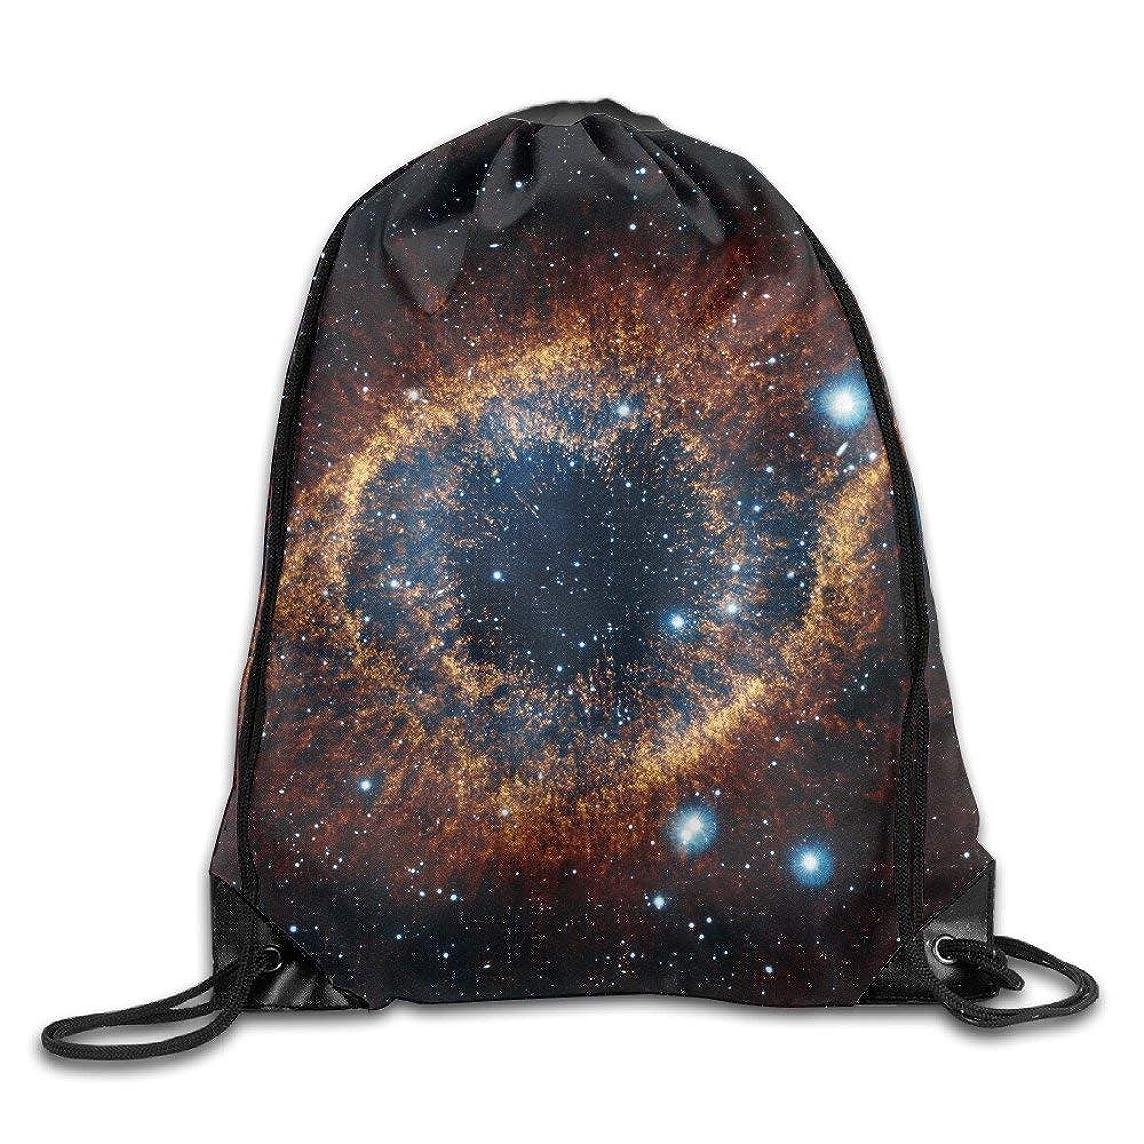 Riuiana Space Galaxy Drawstring Bags Portable Backpack Pocket Travel Sport Gym Bag Yoga Runner Daypack -